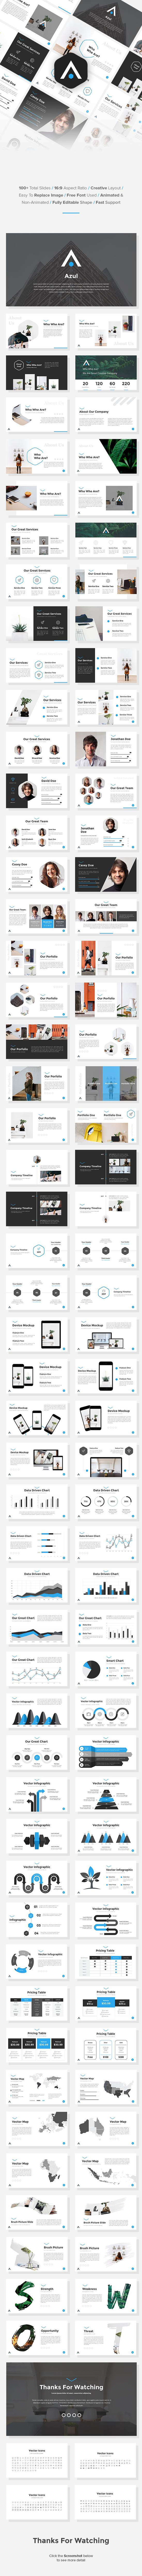 Azul - Business Google Slides Template - Google Slides Presentation Templates